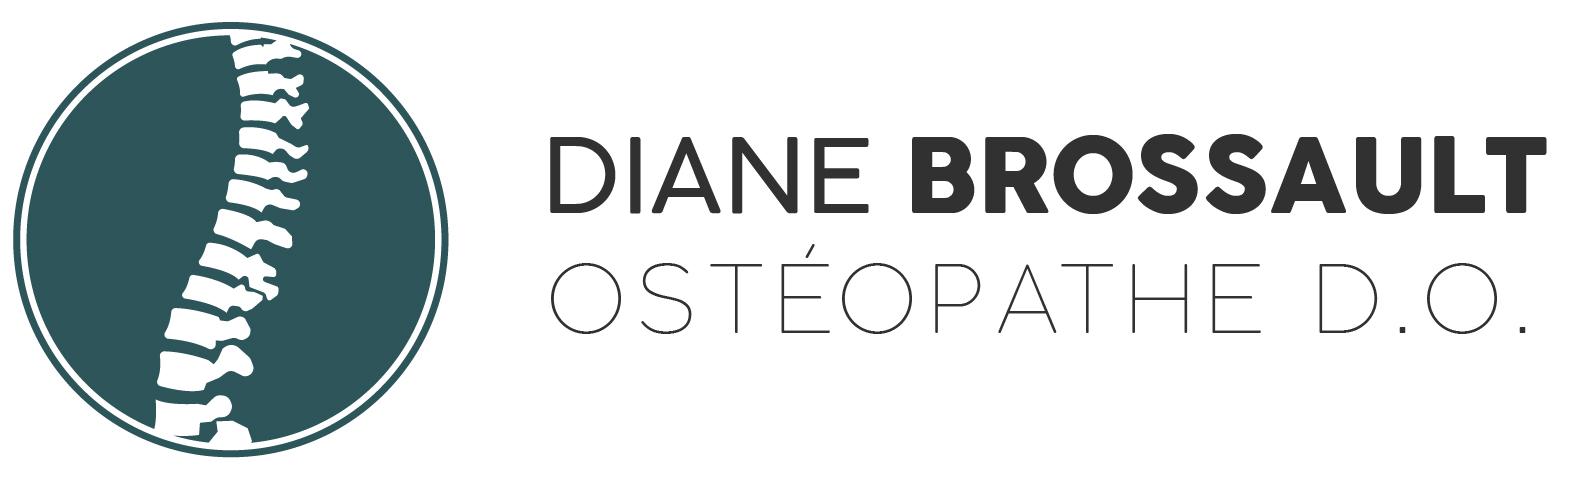 Diane Brossault Ostéopathe